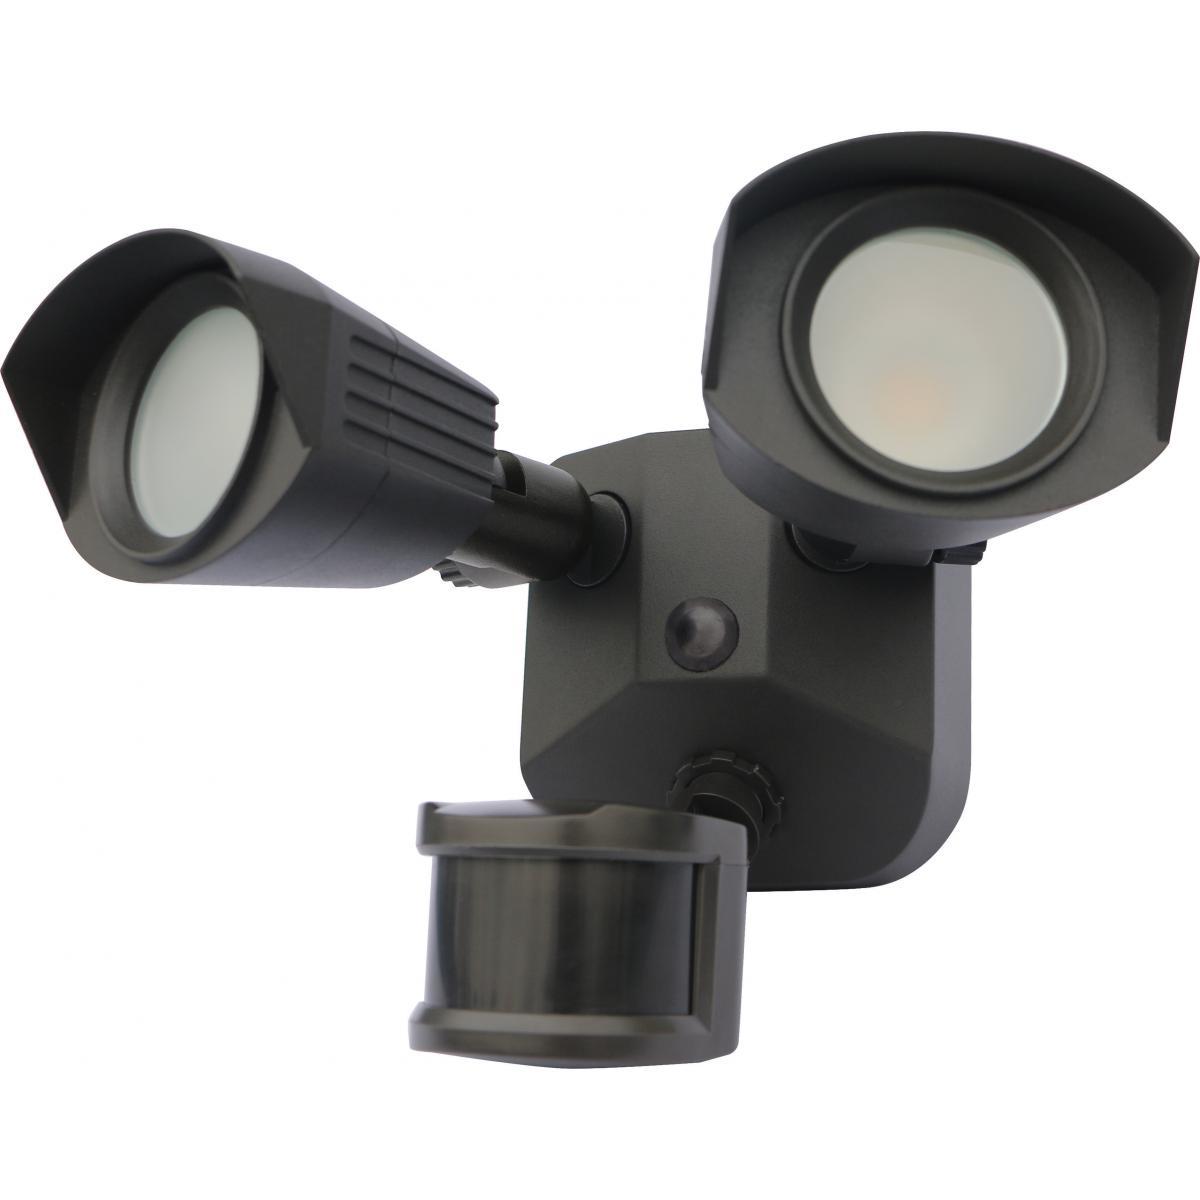 65-213 LED DUAL HEAD SECURITY LIGHT